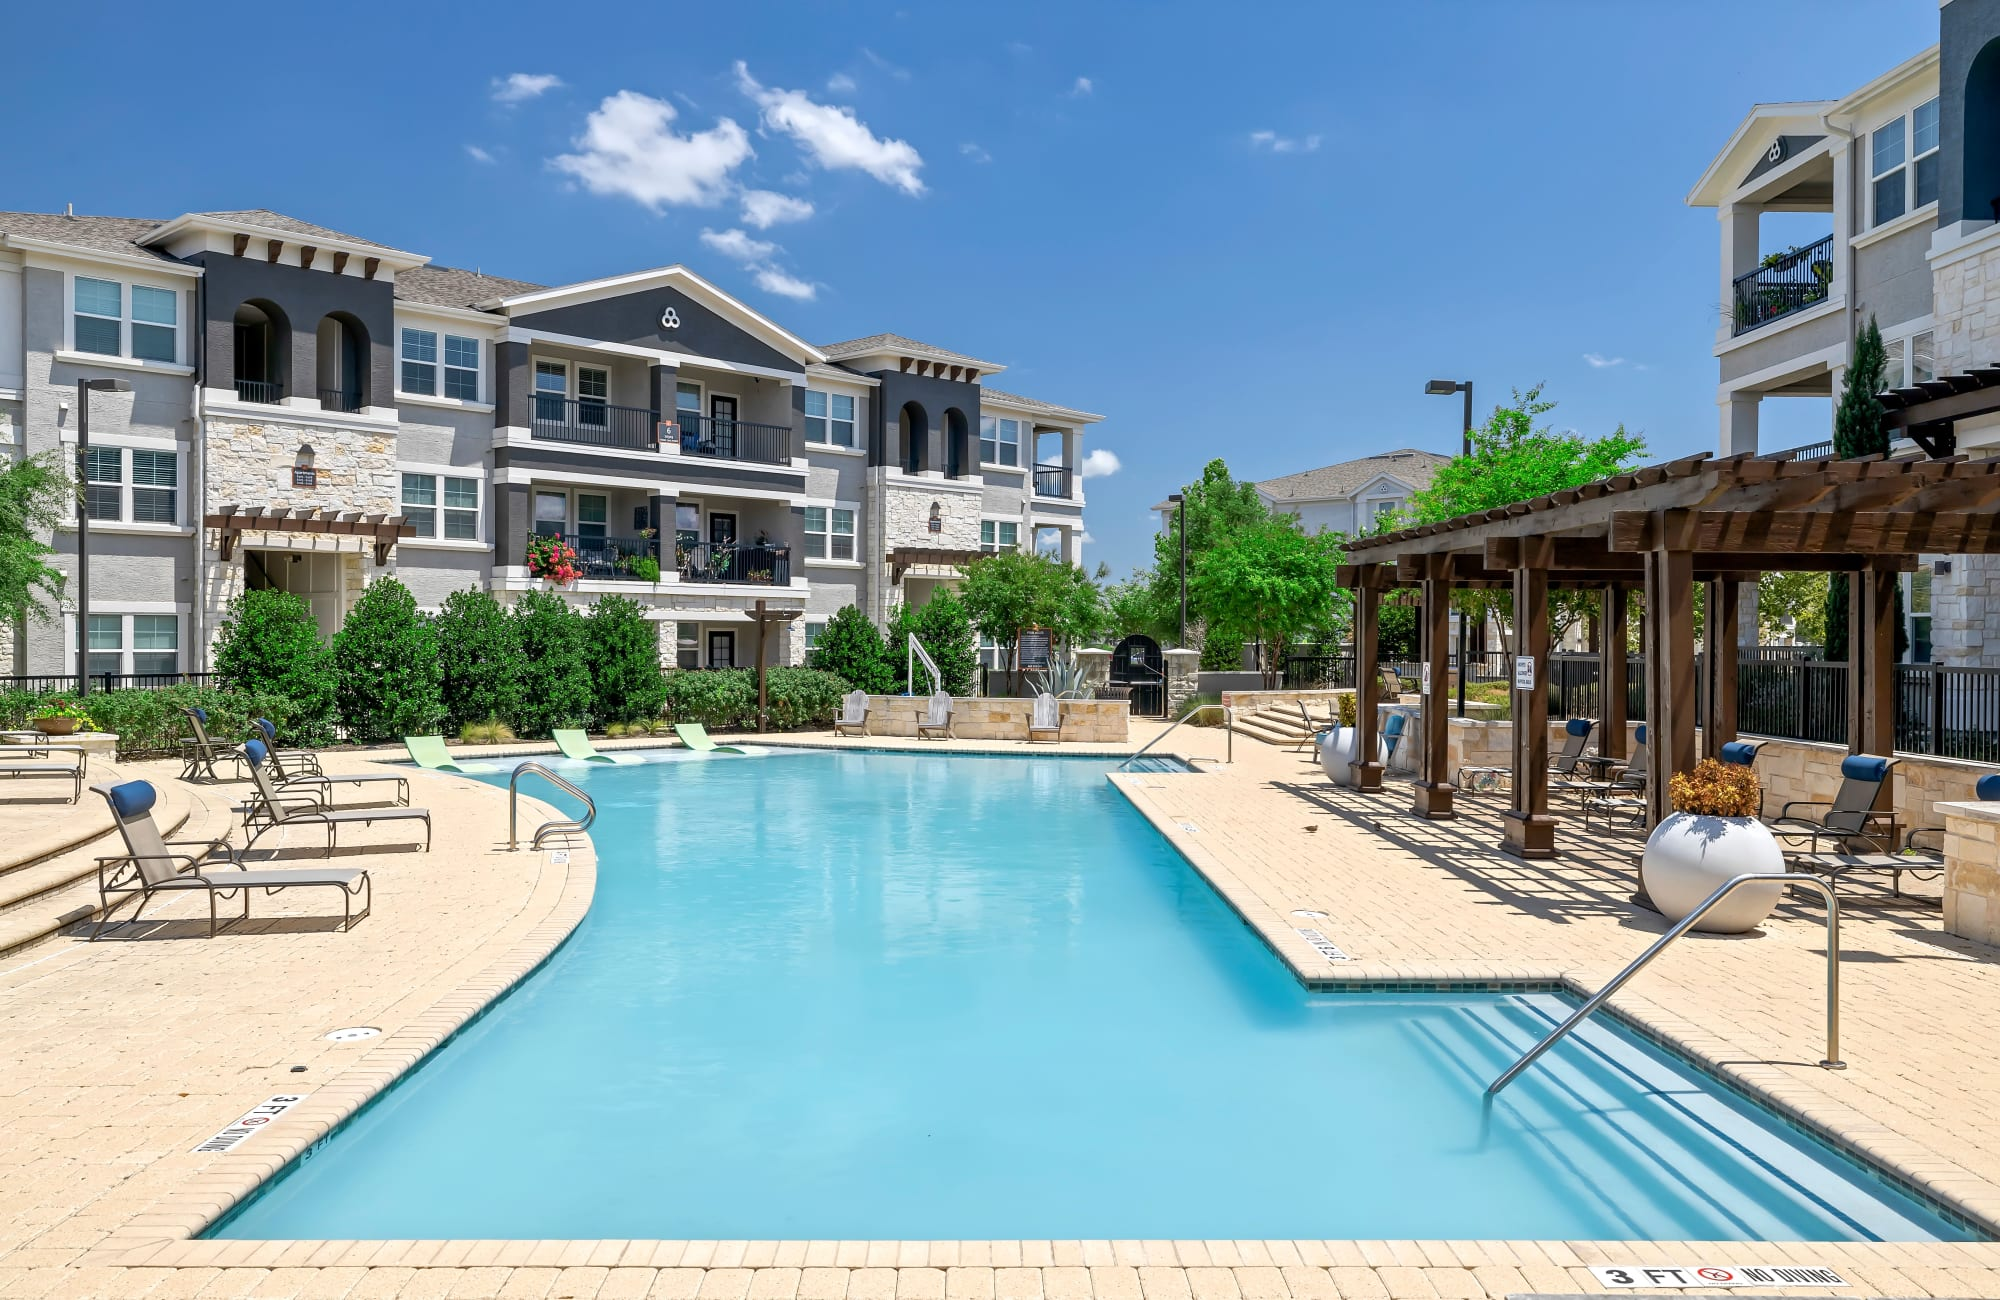 Apartments at Wiregrass at Stone Oak in San Antonio, Texas